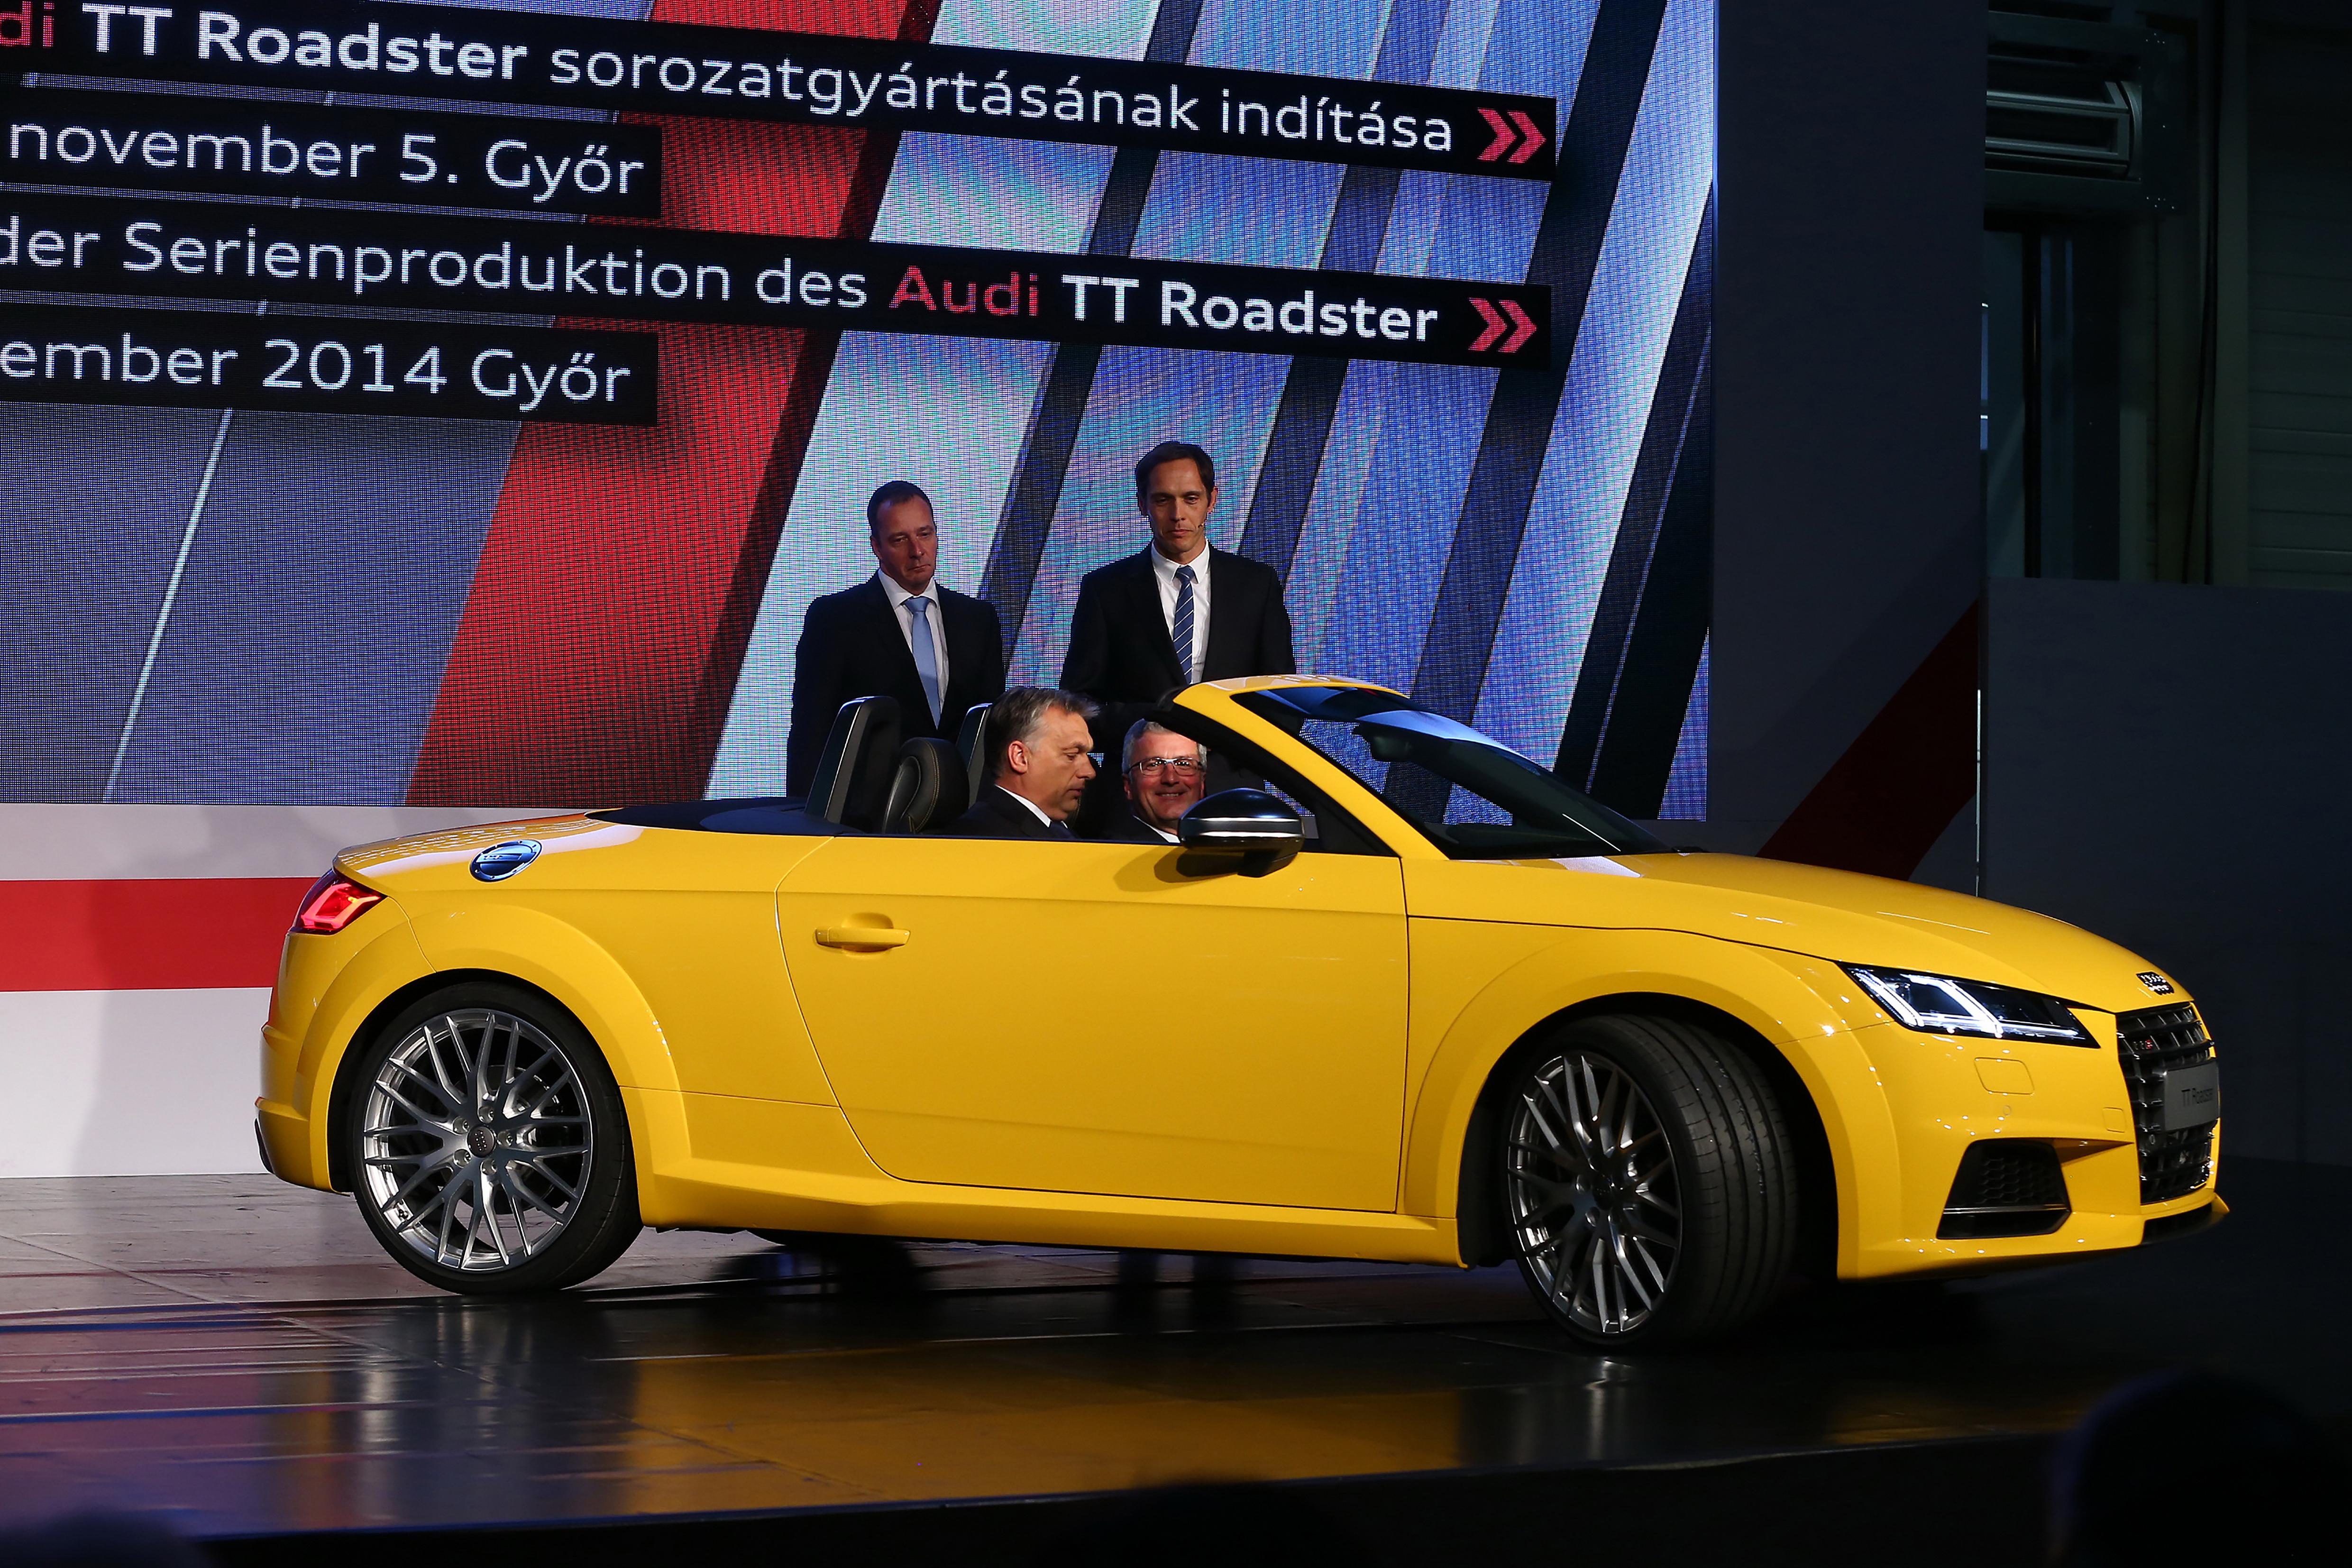 2015 Audi TT Roadster Production Starts in Hungary  autoevolution